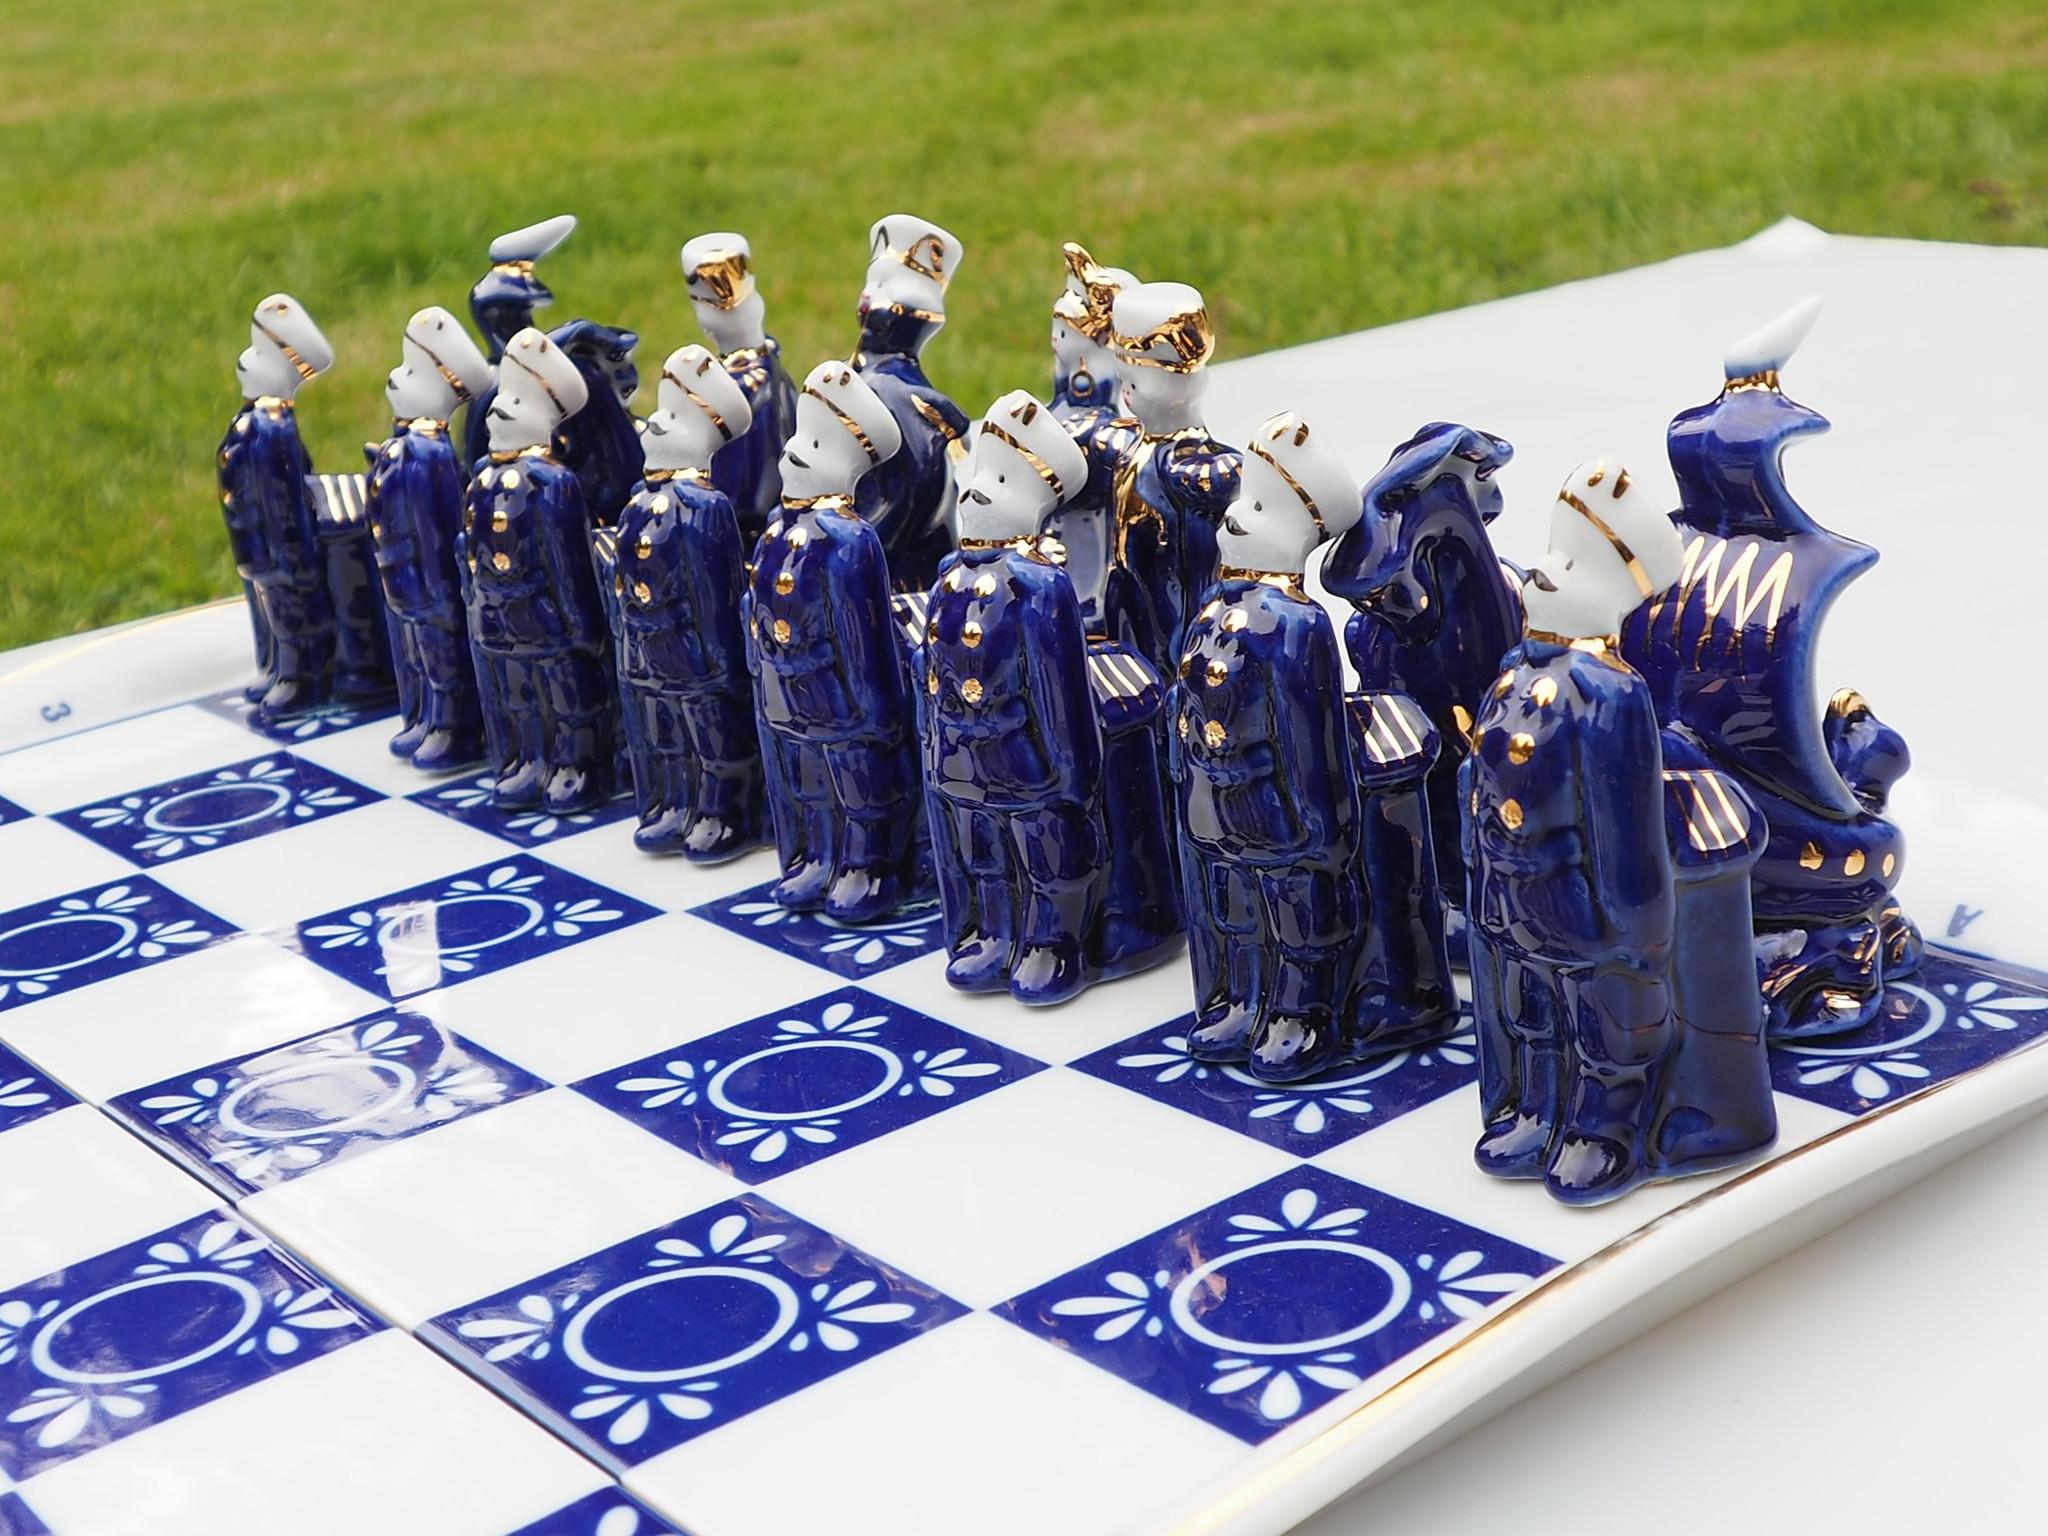 Rare Vintage Gardner Verbilki Russian Porcelain Chess Set  (blue )